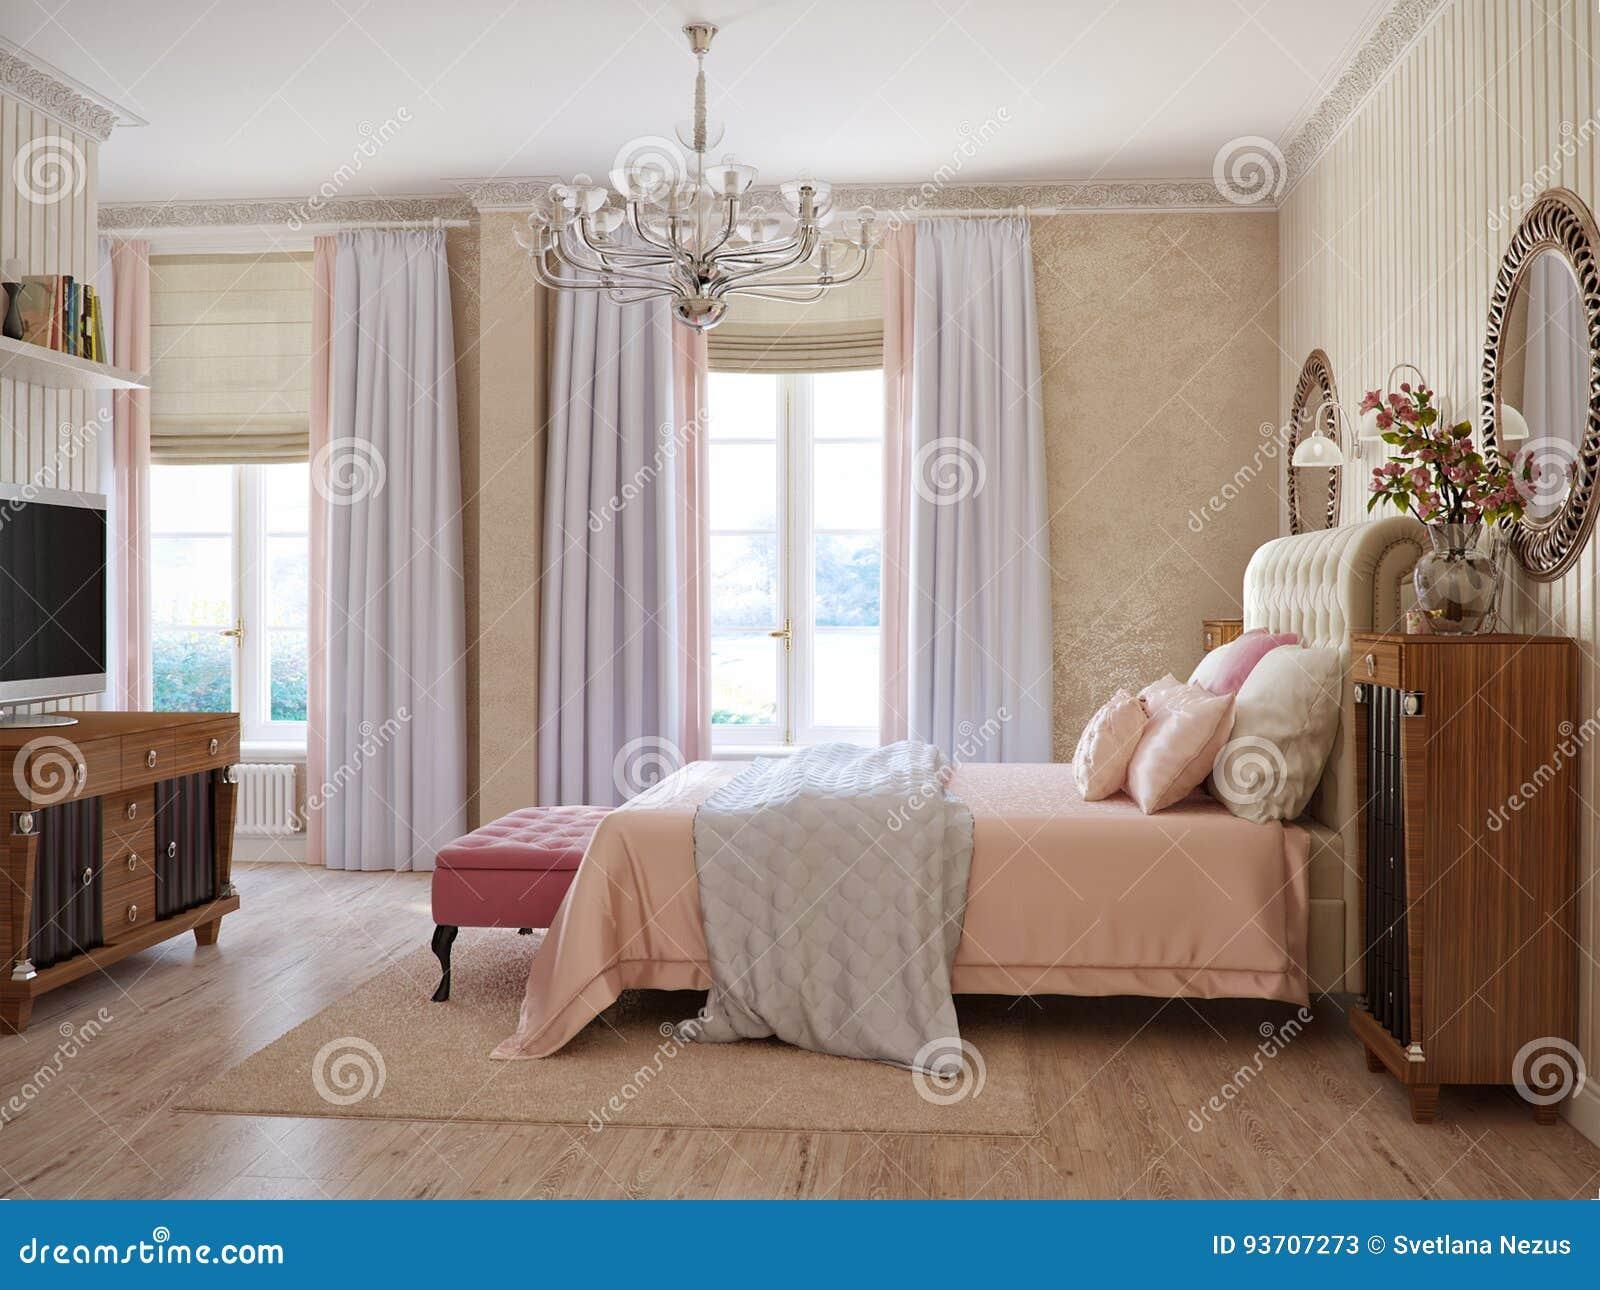 Camera da letto rustica moderna classica tradizionale - Camera da letto rustica moderna ...